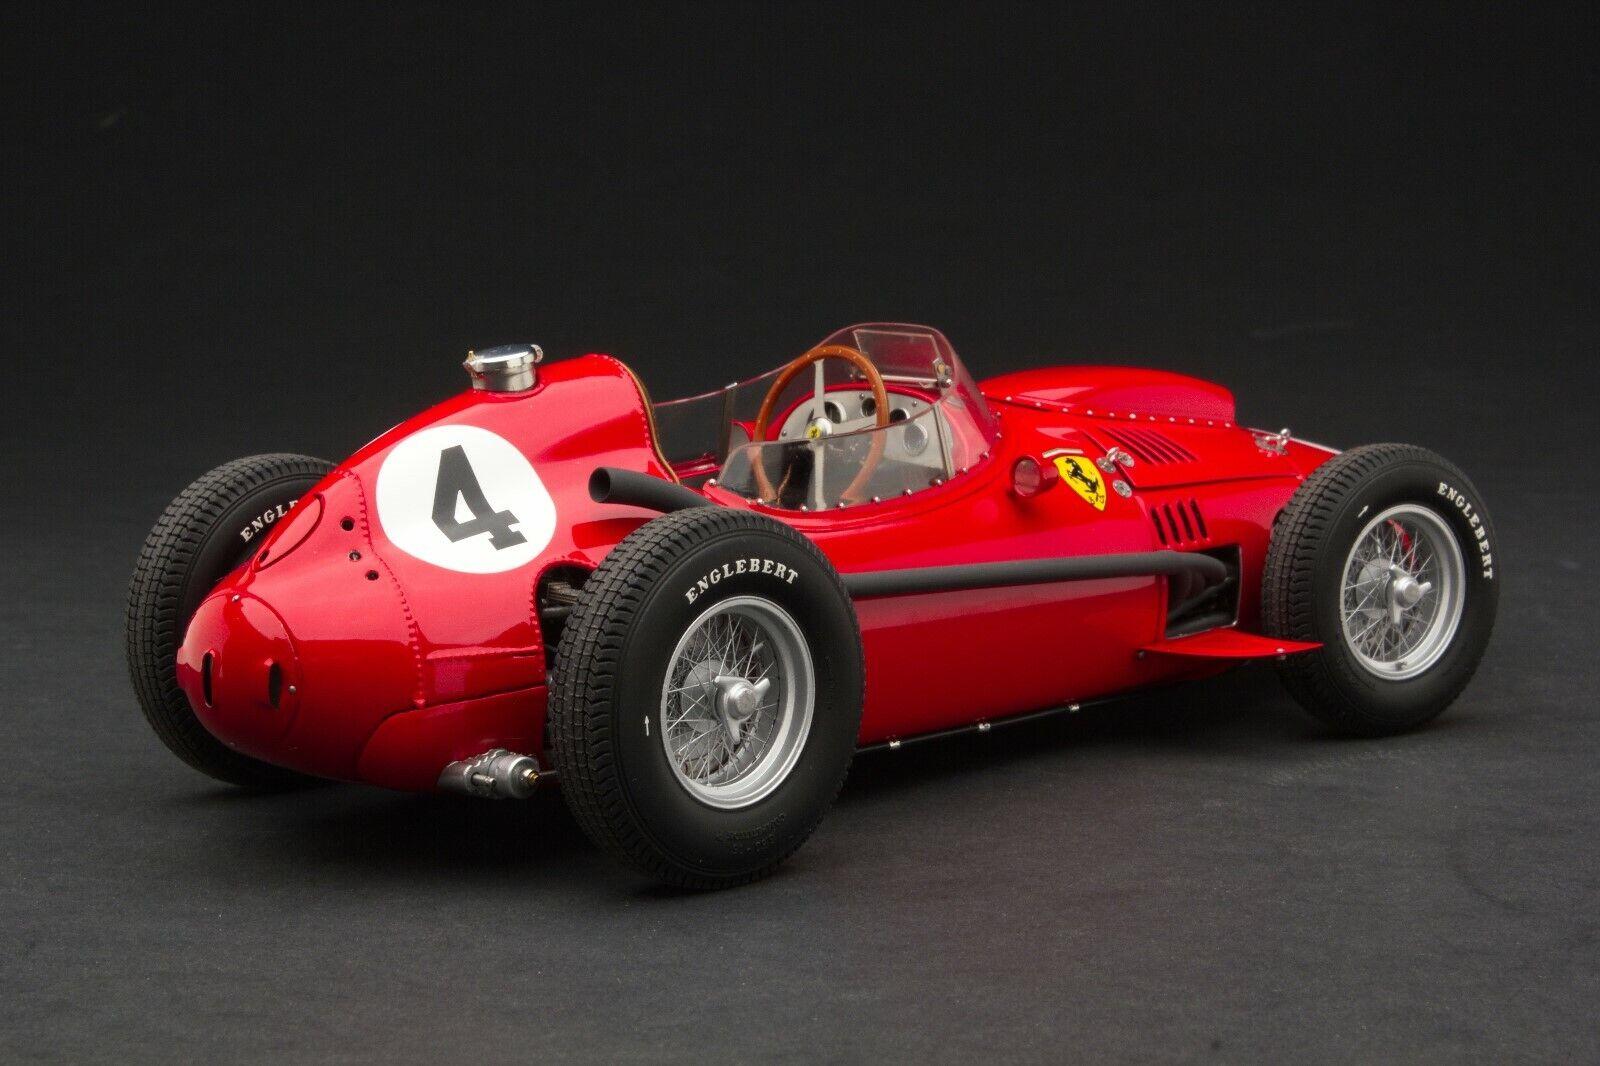 Exoto XS 1 18   1958 Ferrari Dino 246 F1 Grand Prix de Francia Ganador   GPC97210